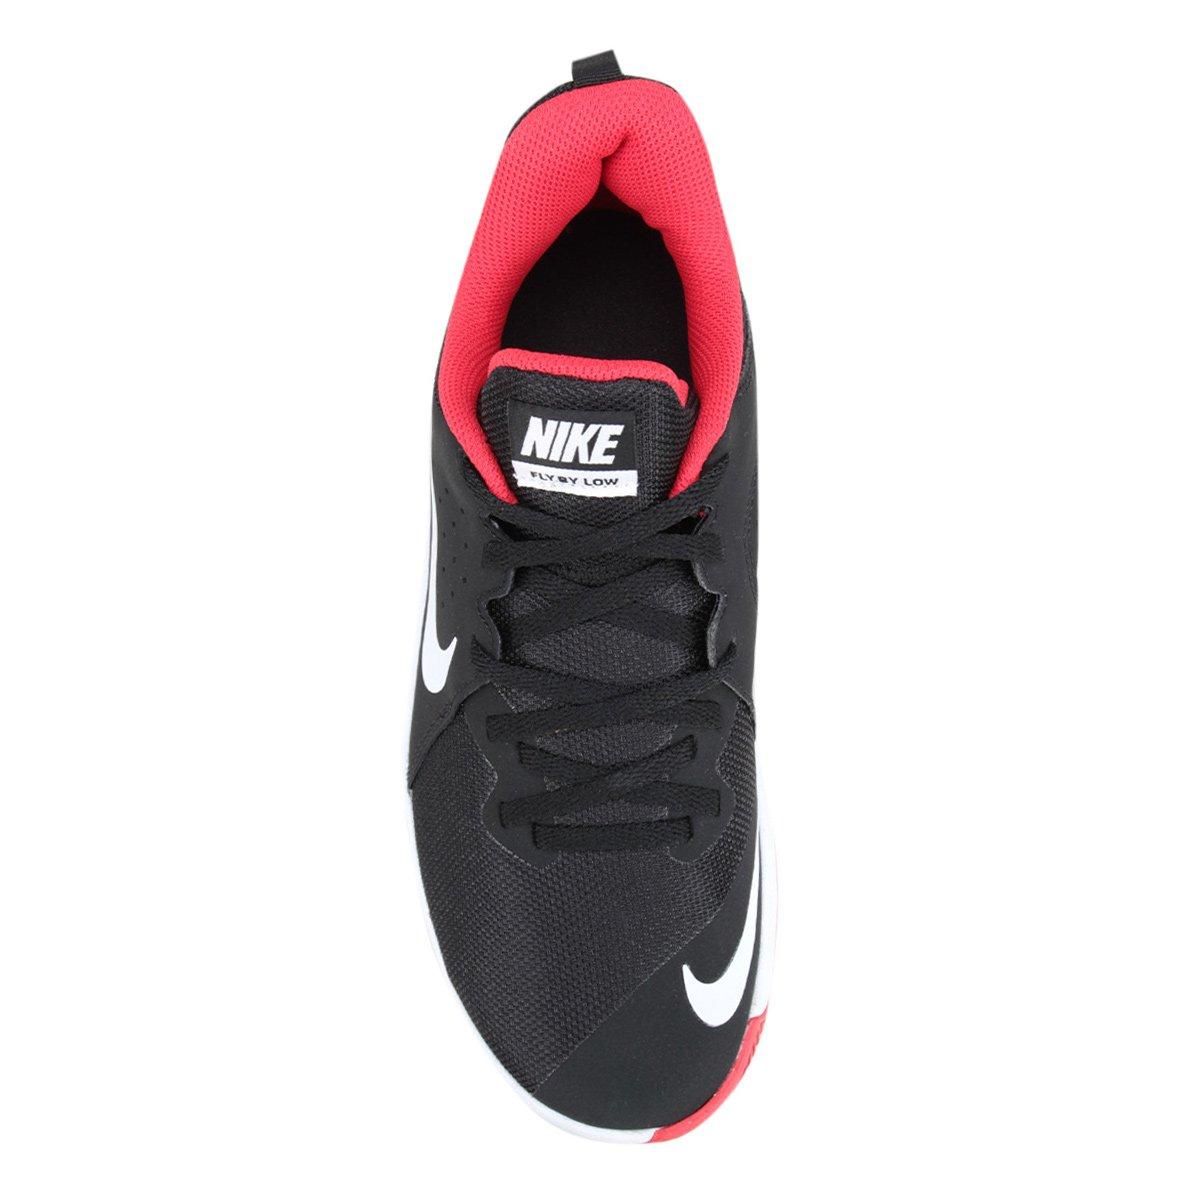 Tênis Nike Fly.By Low Masculino - Preto - Compre Agora  0501b59c50ad8